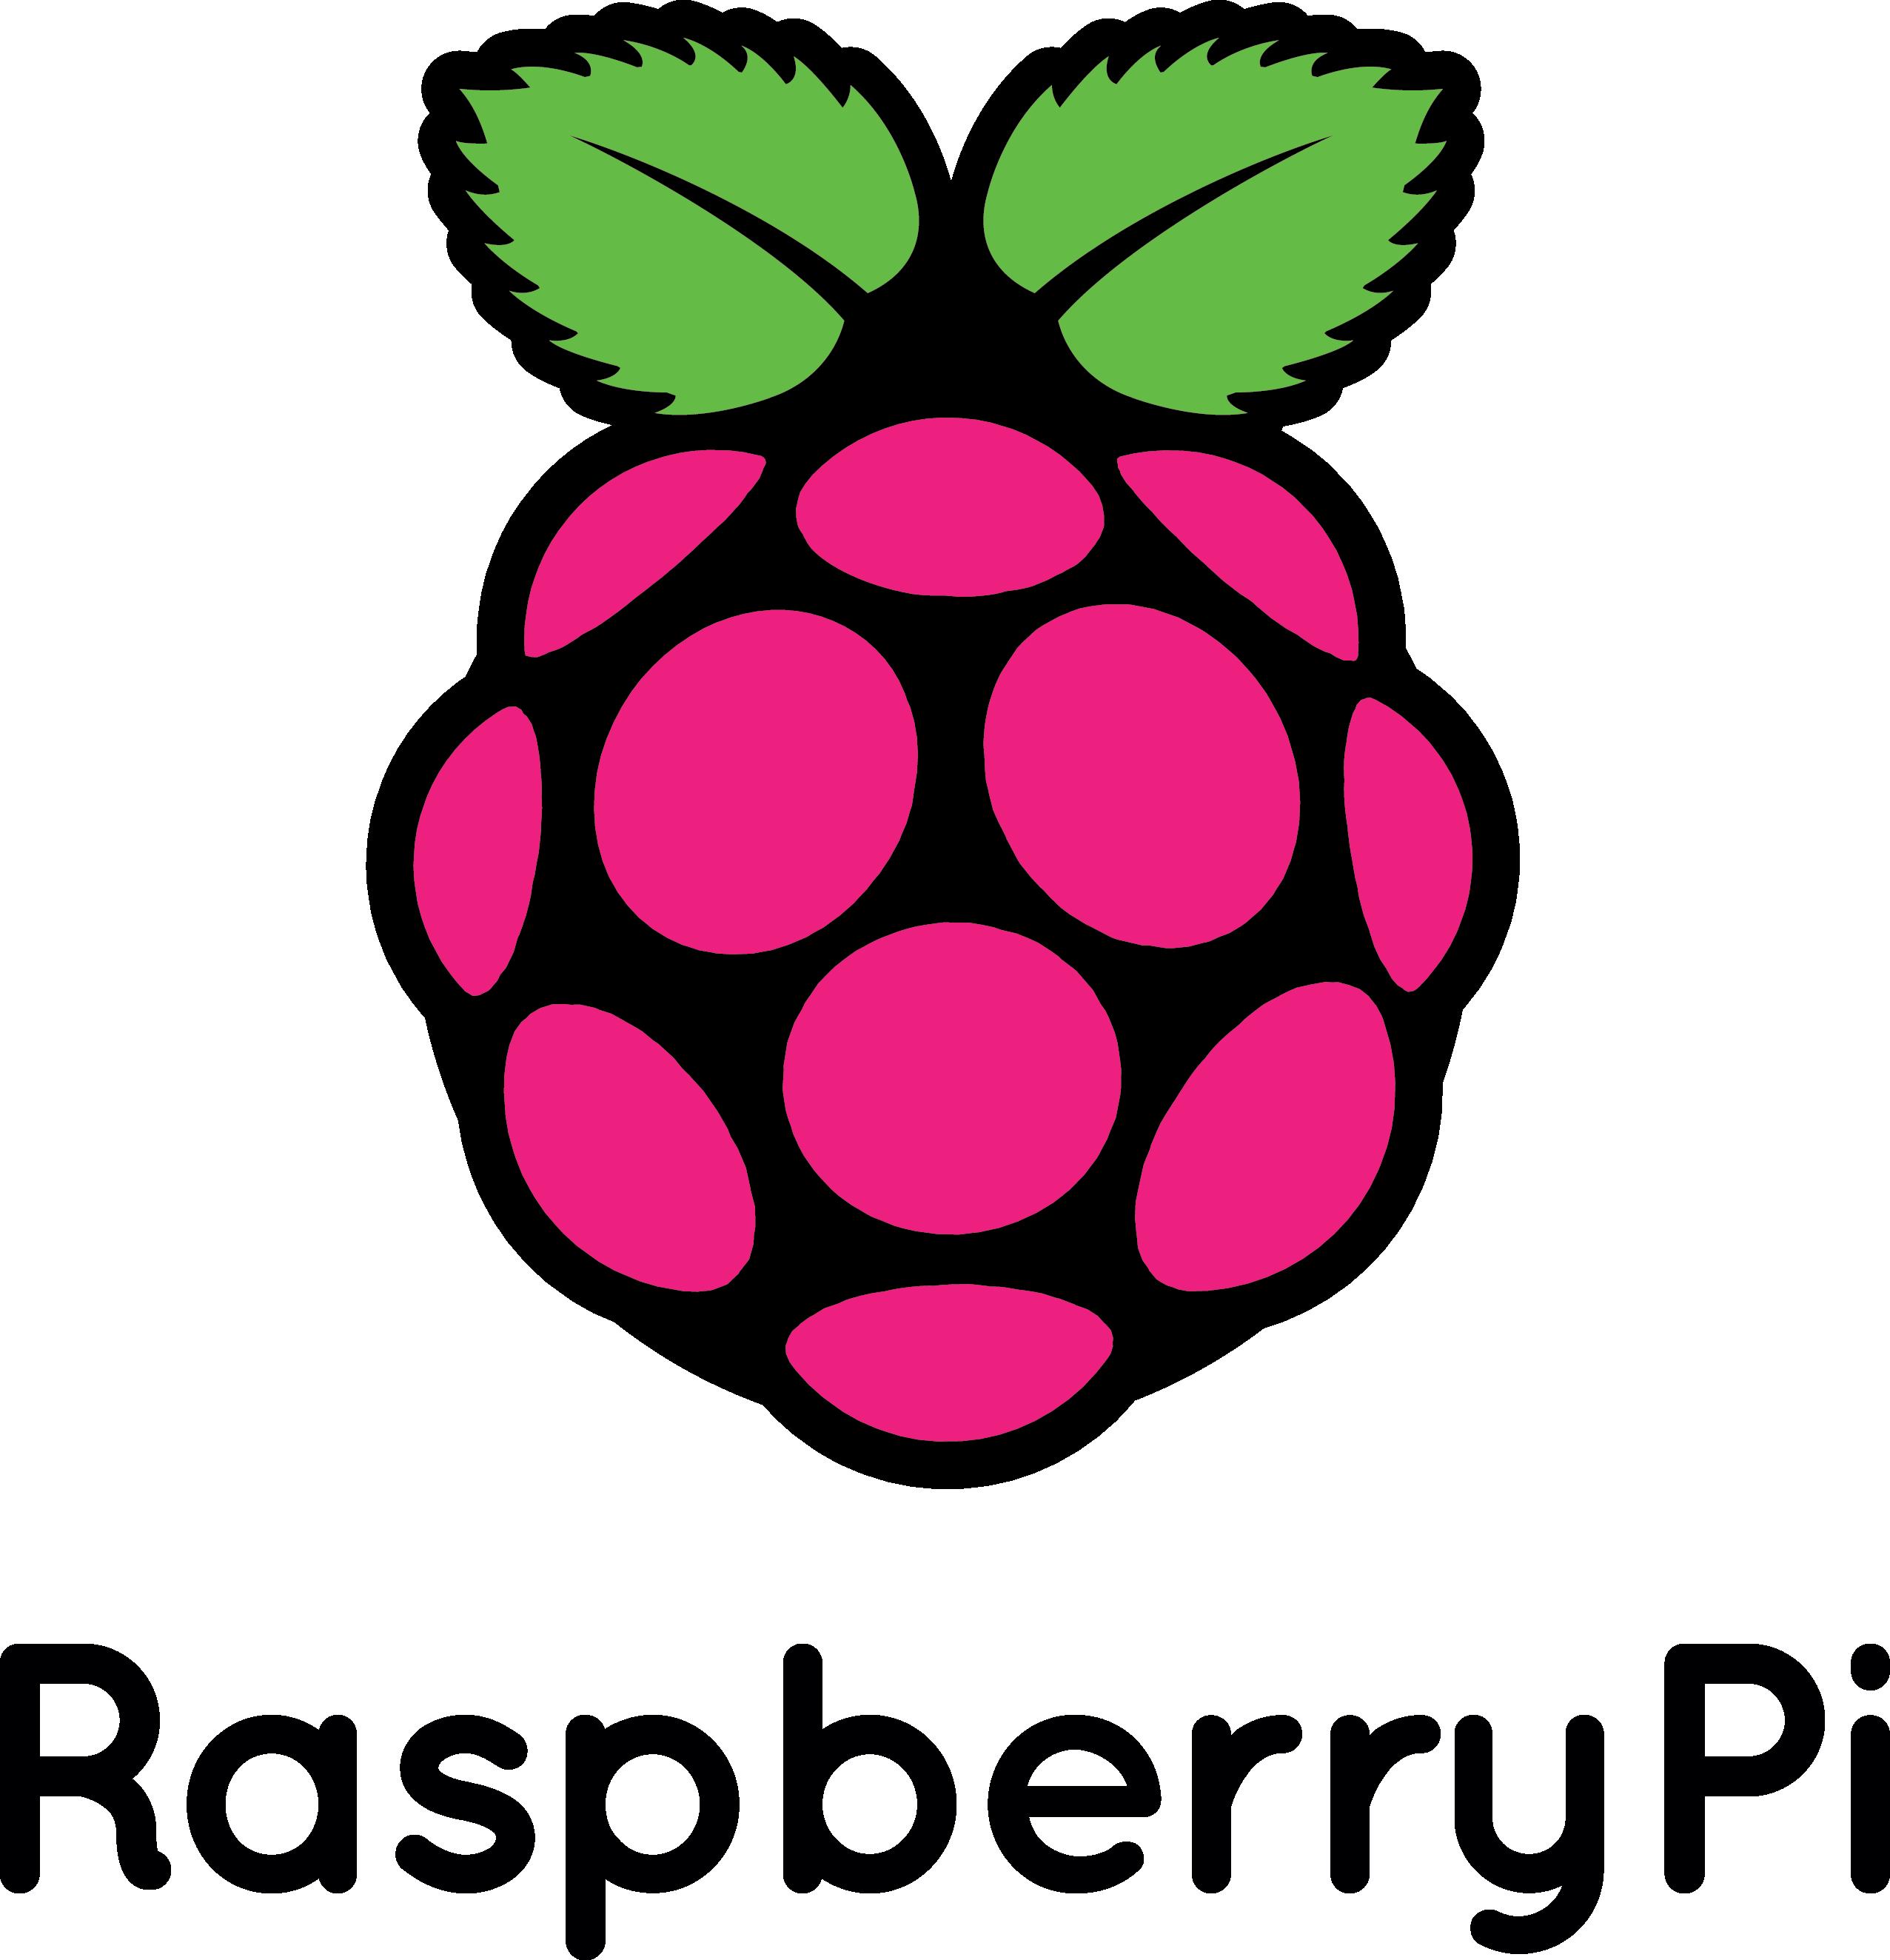 Raspberry Pi logo D&G Computer Club 아두이노, 라즈베리 및 기술